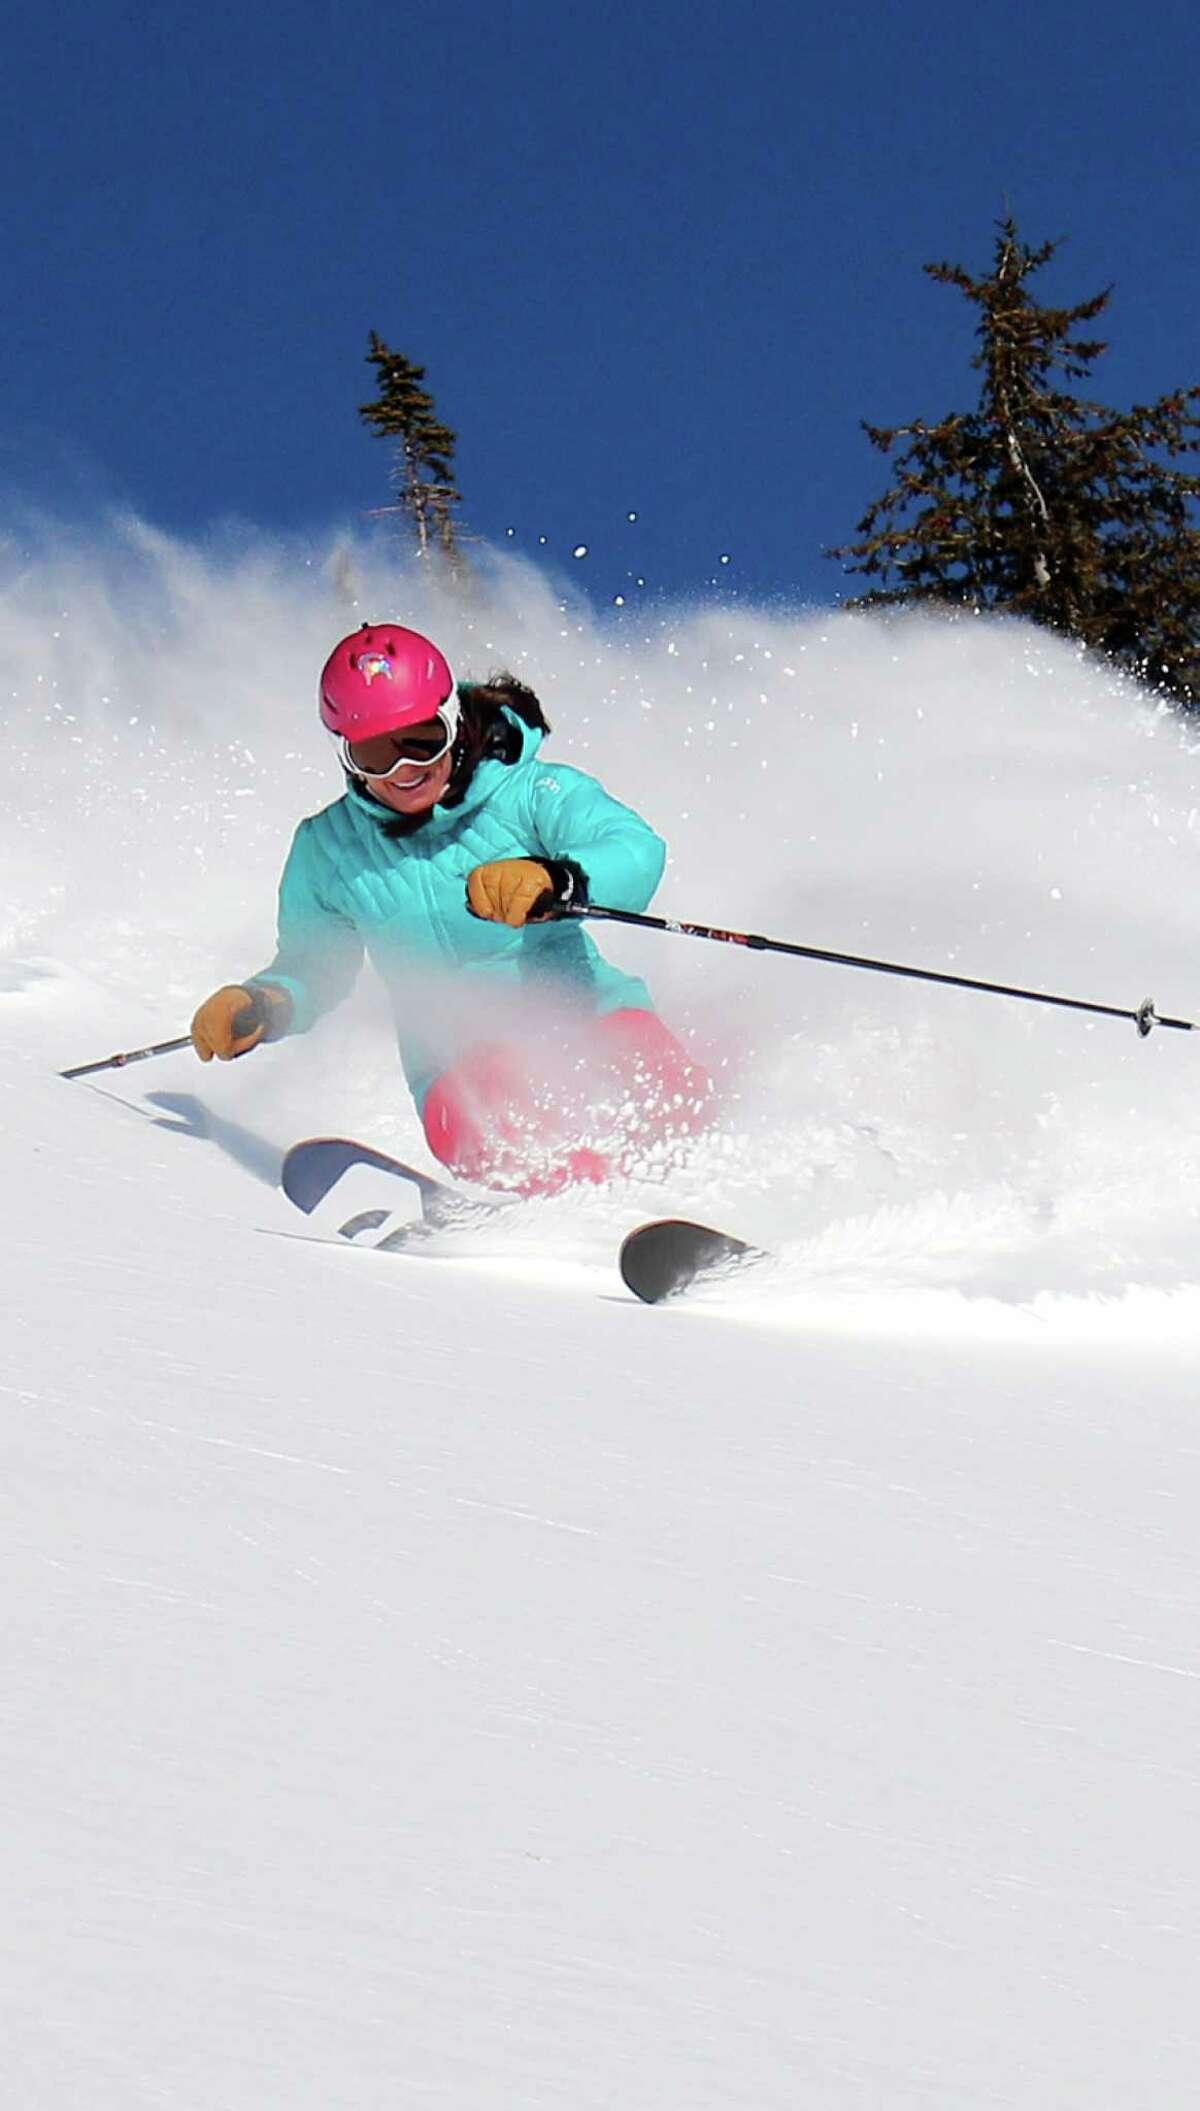 Elevate Women's Ski Camp allows participants opportunities to improve technique among Jackson Hole's difficult terrain.